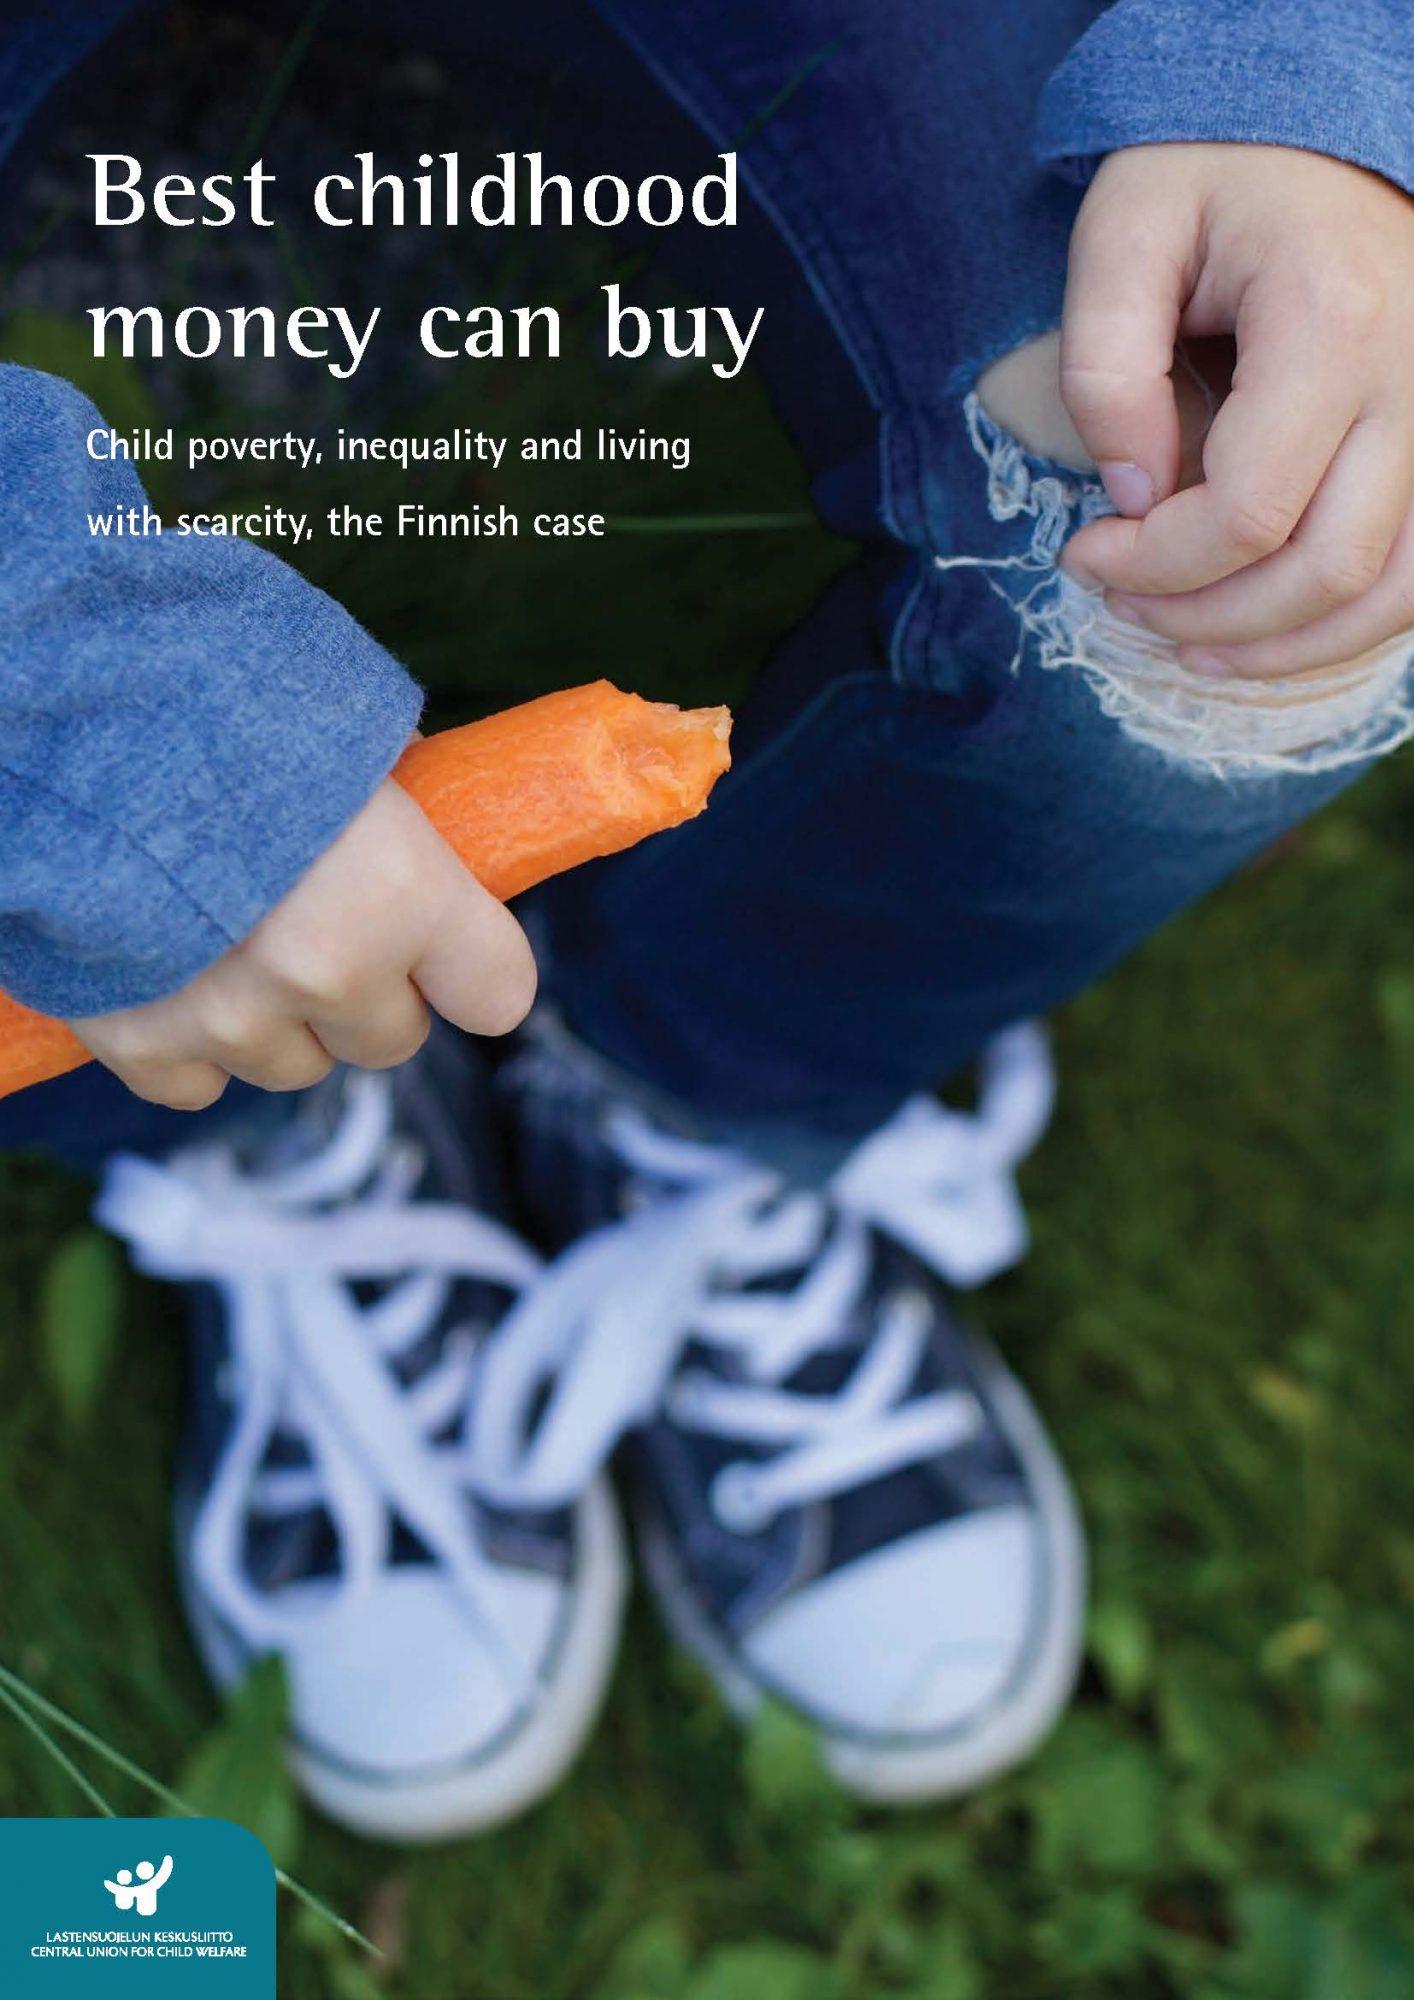 Best childhood money can buy